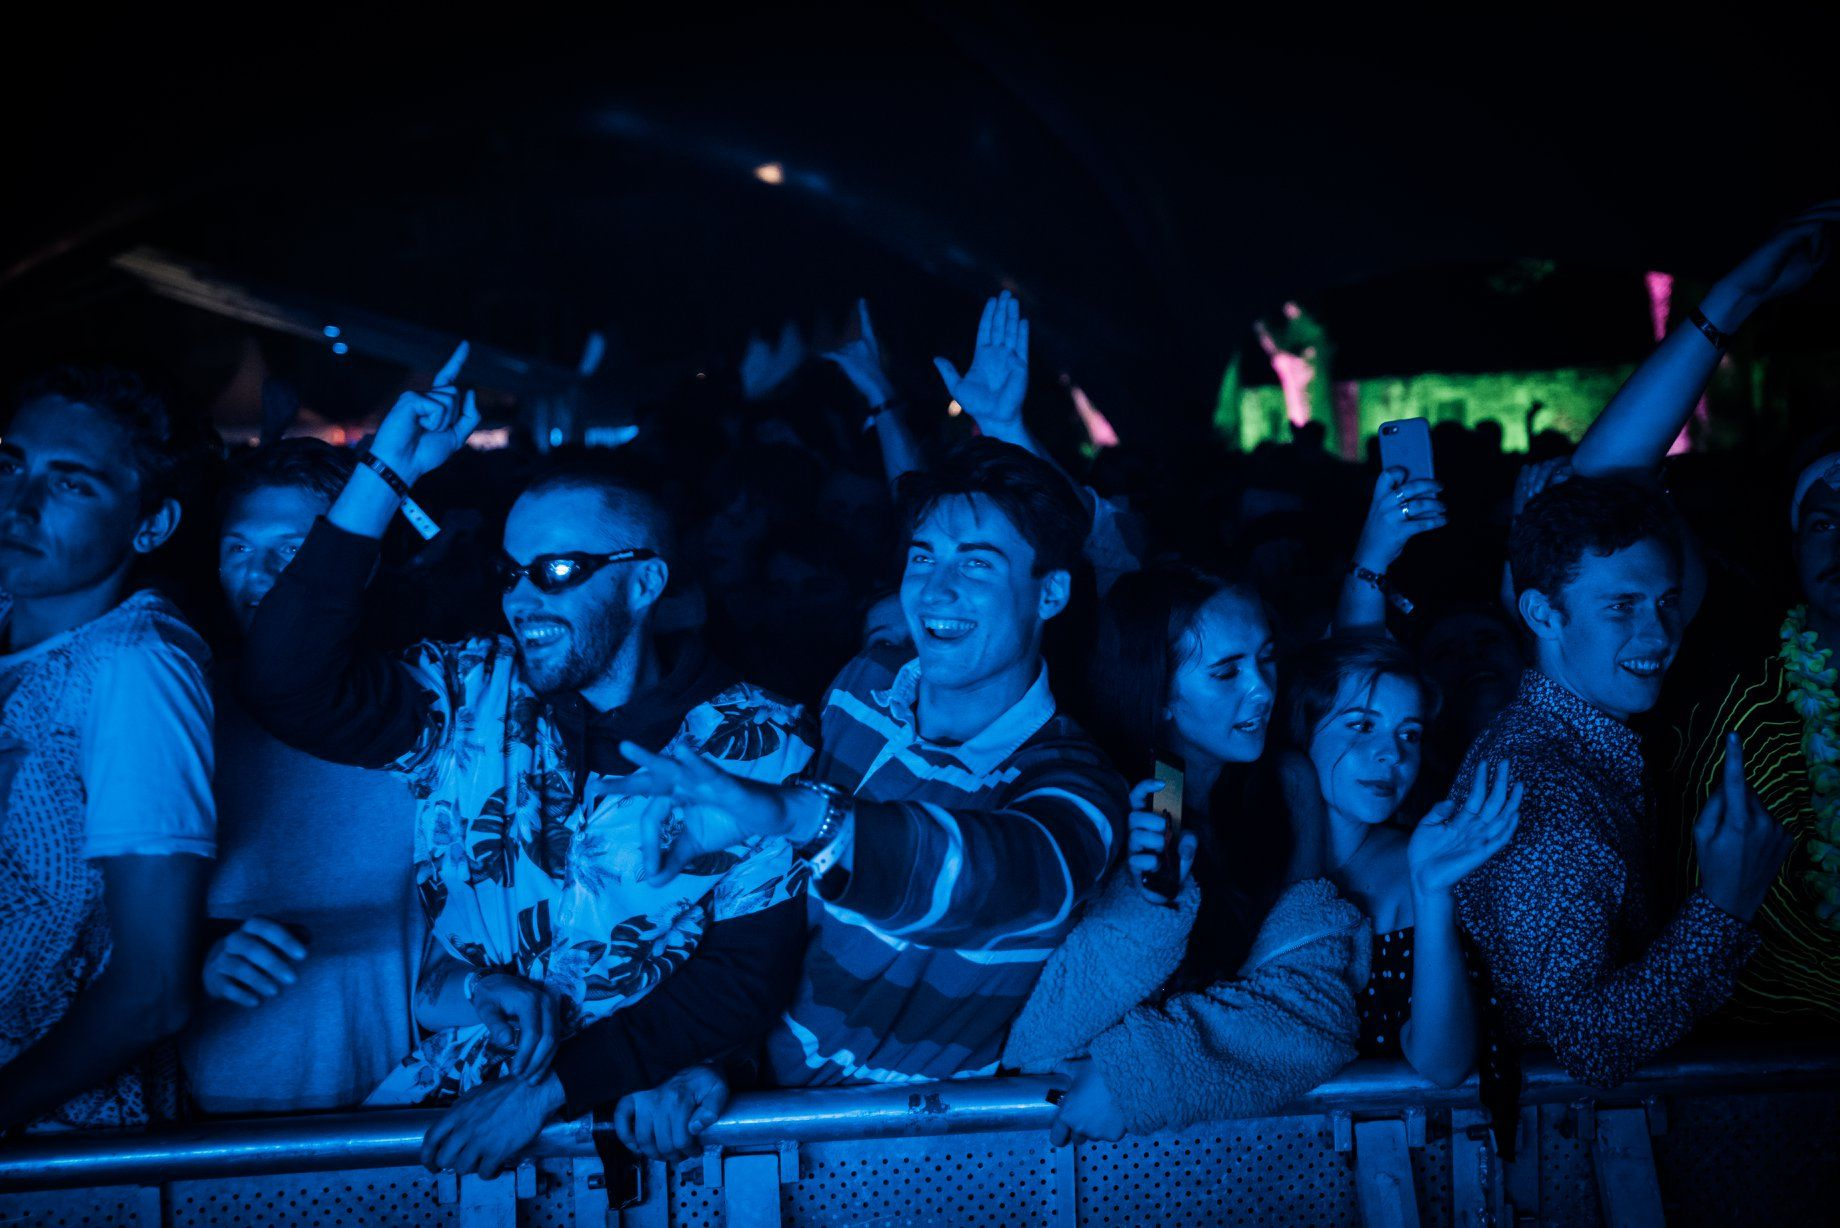 Image may contain: Night Club, Lighting, Audience, Crowd, Club, Night Life, Human, Person